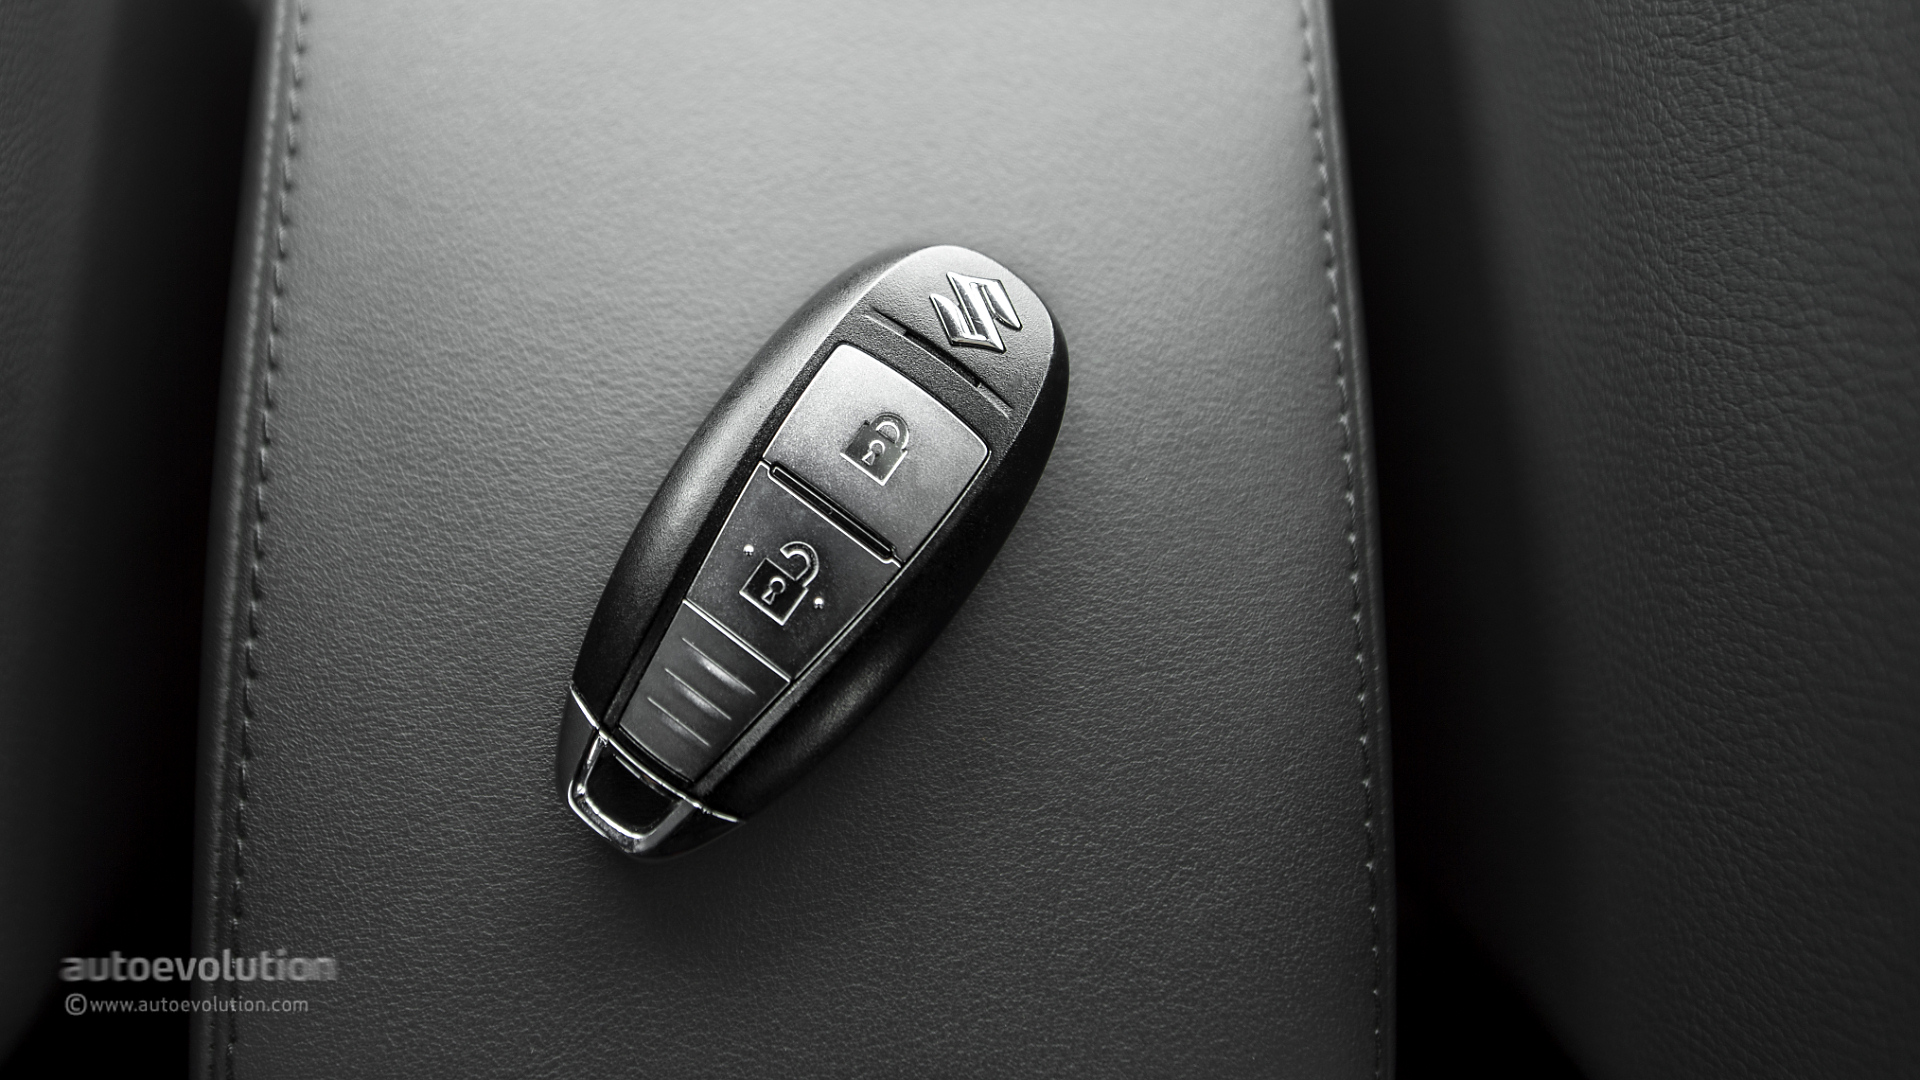 Suzuki SX4 S-Cross Review - autoevolution